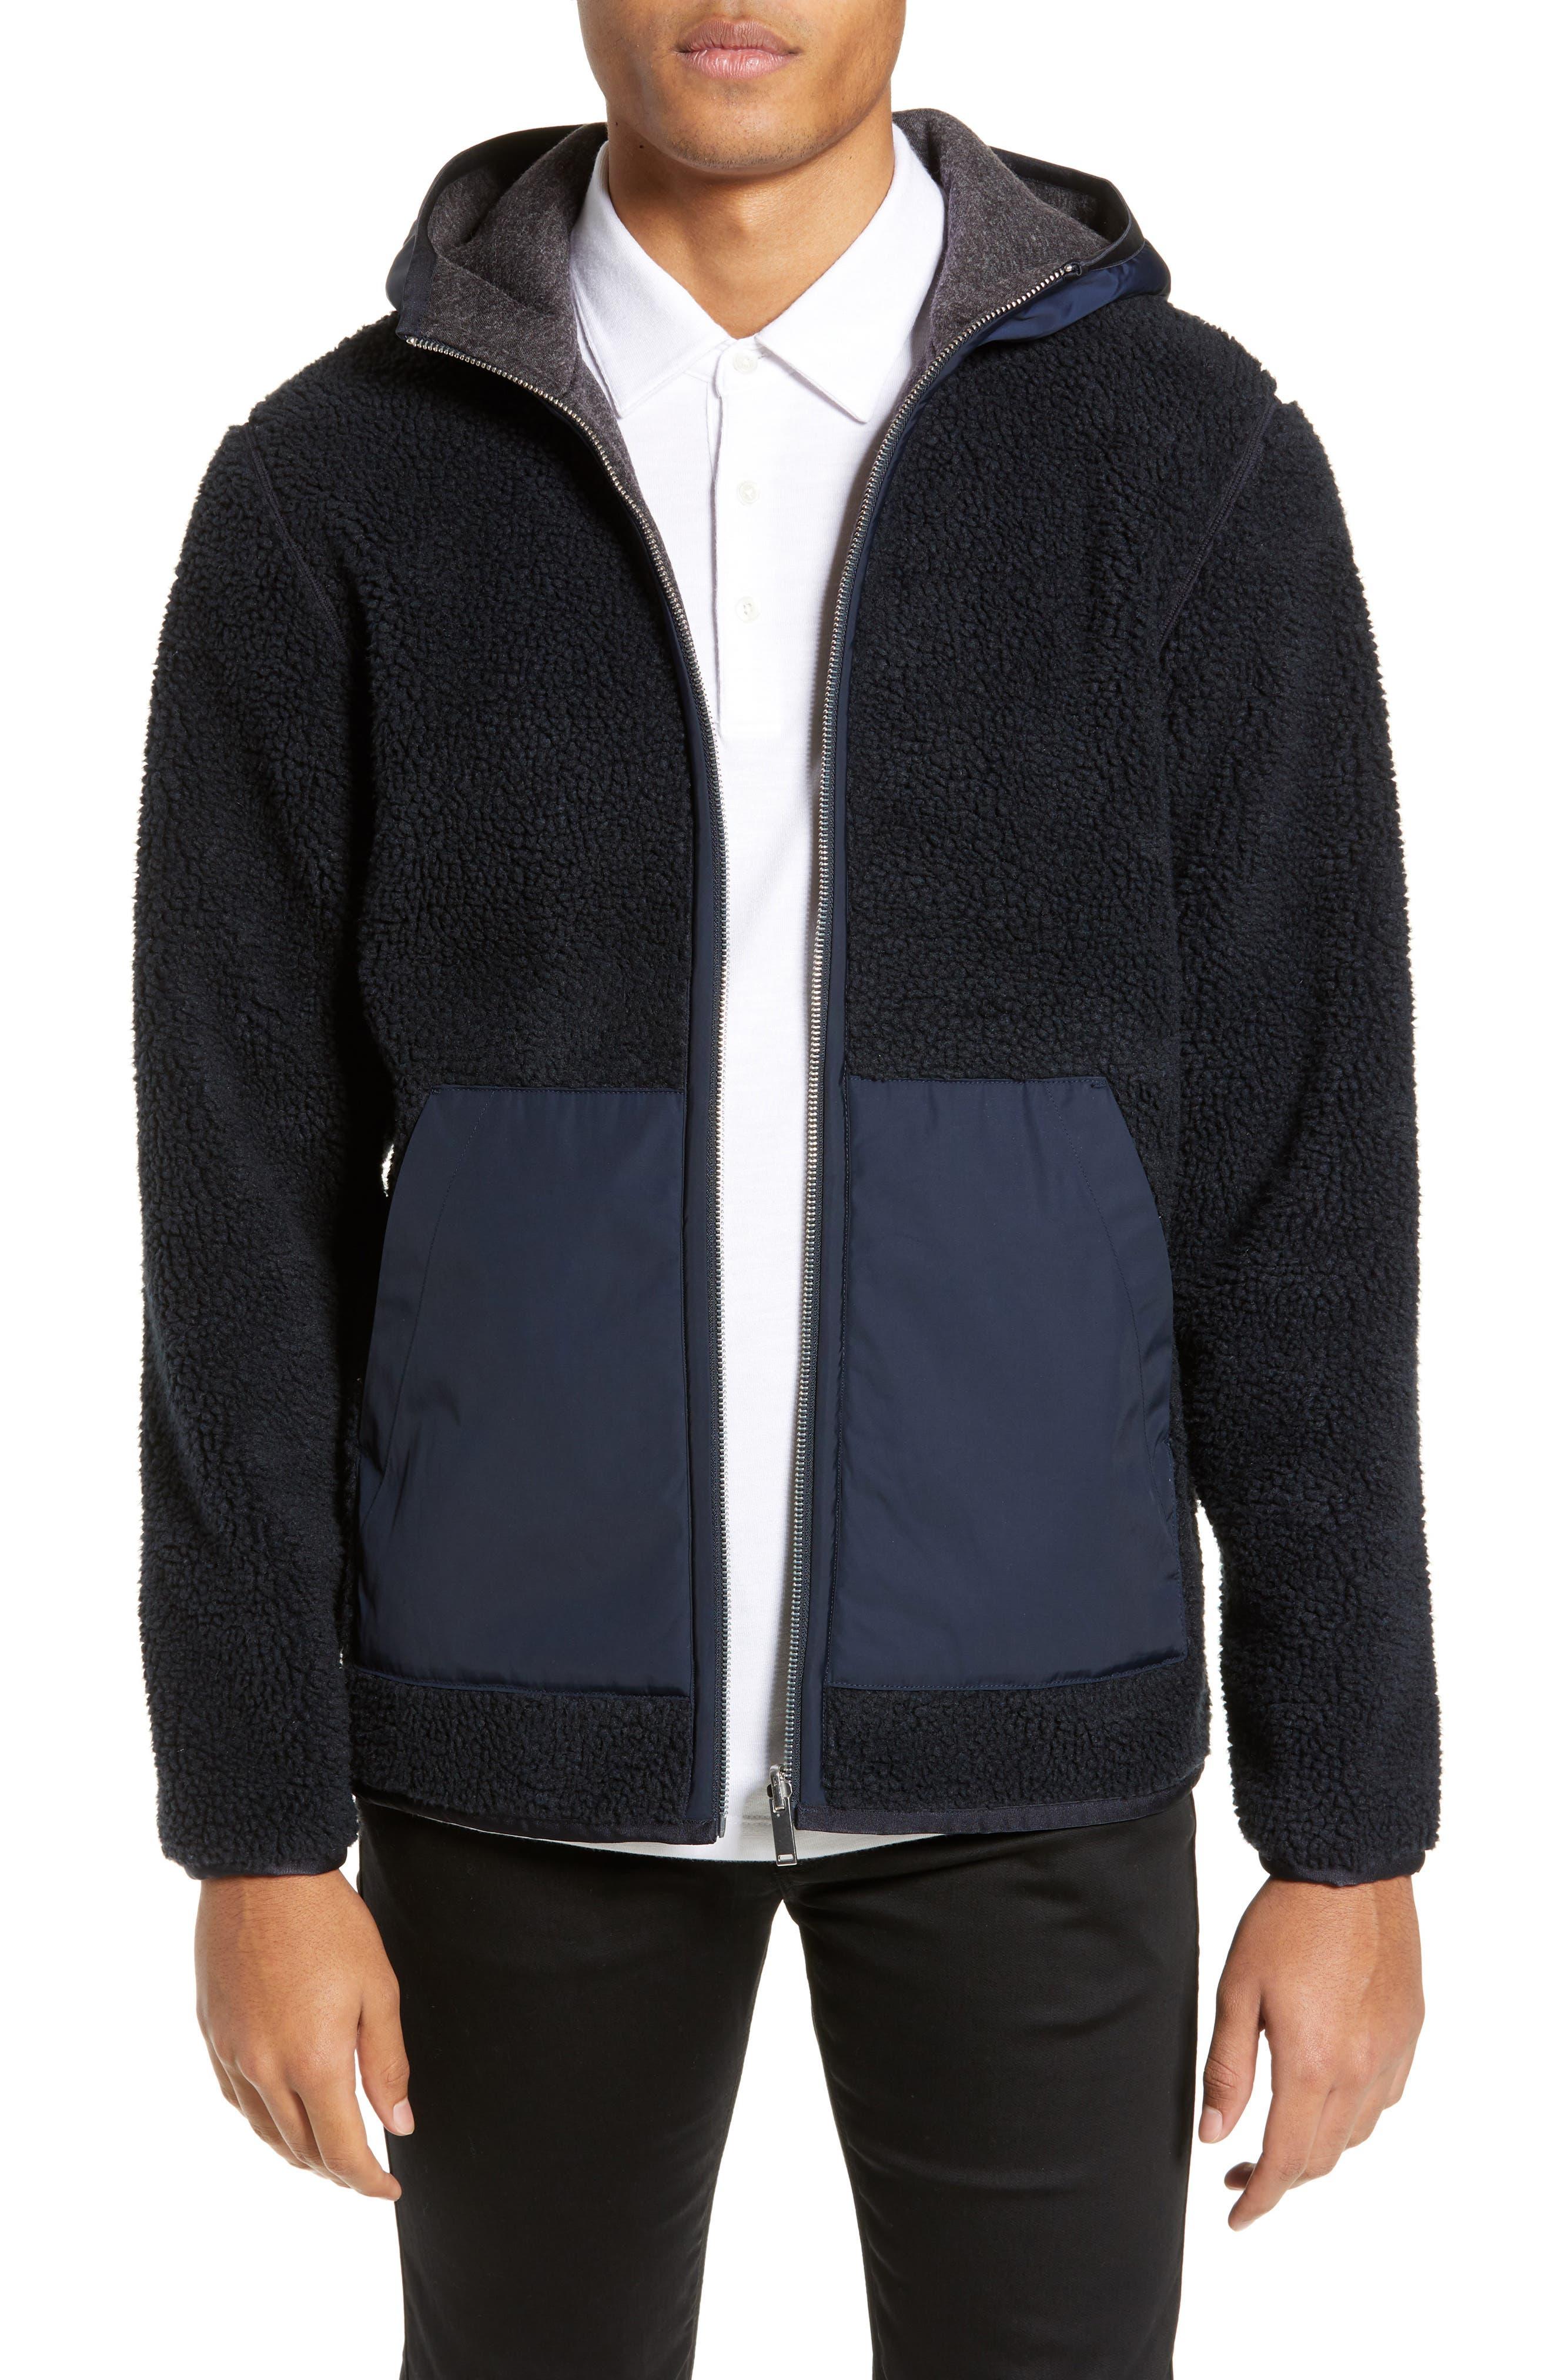 THEORY Polar Fleece Reversible Zip Hoodie, Main, color, ECLIPSE/ ASHPALT MELANGE